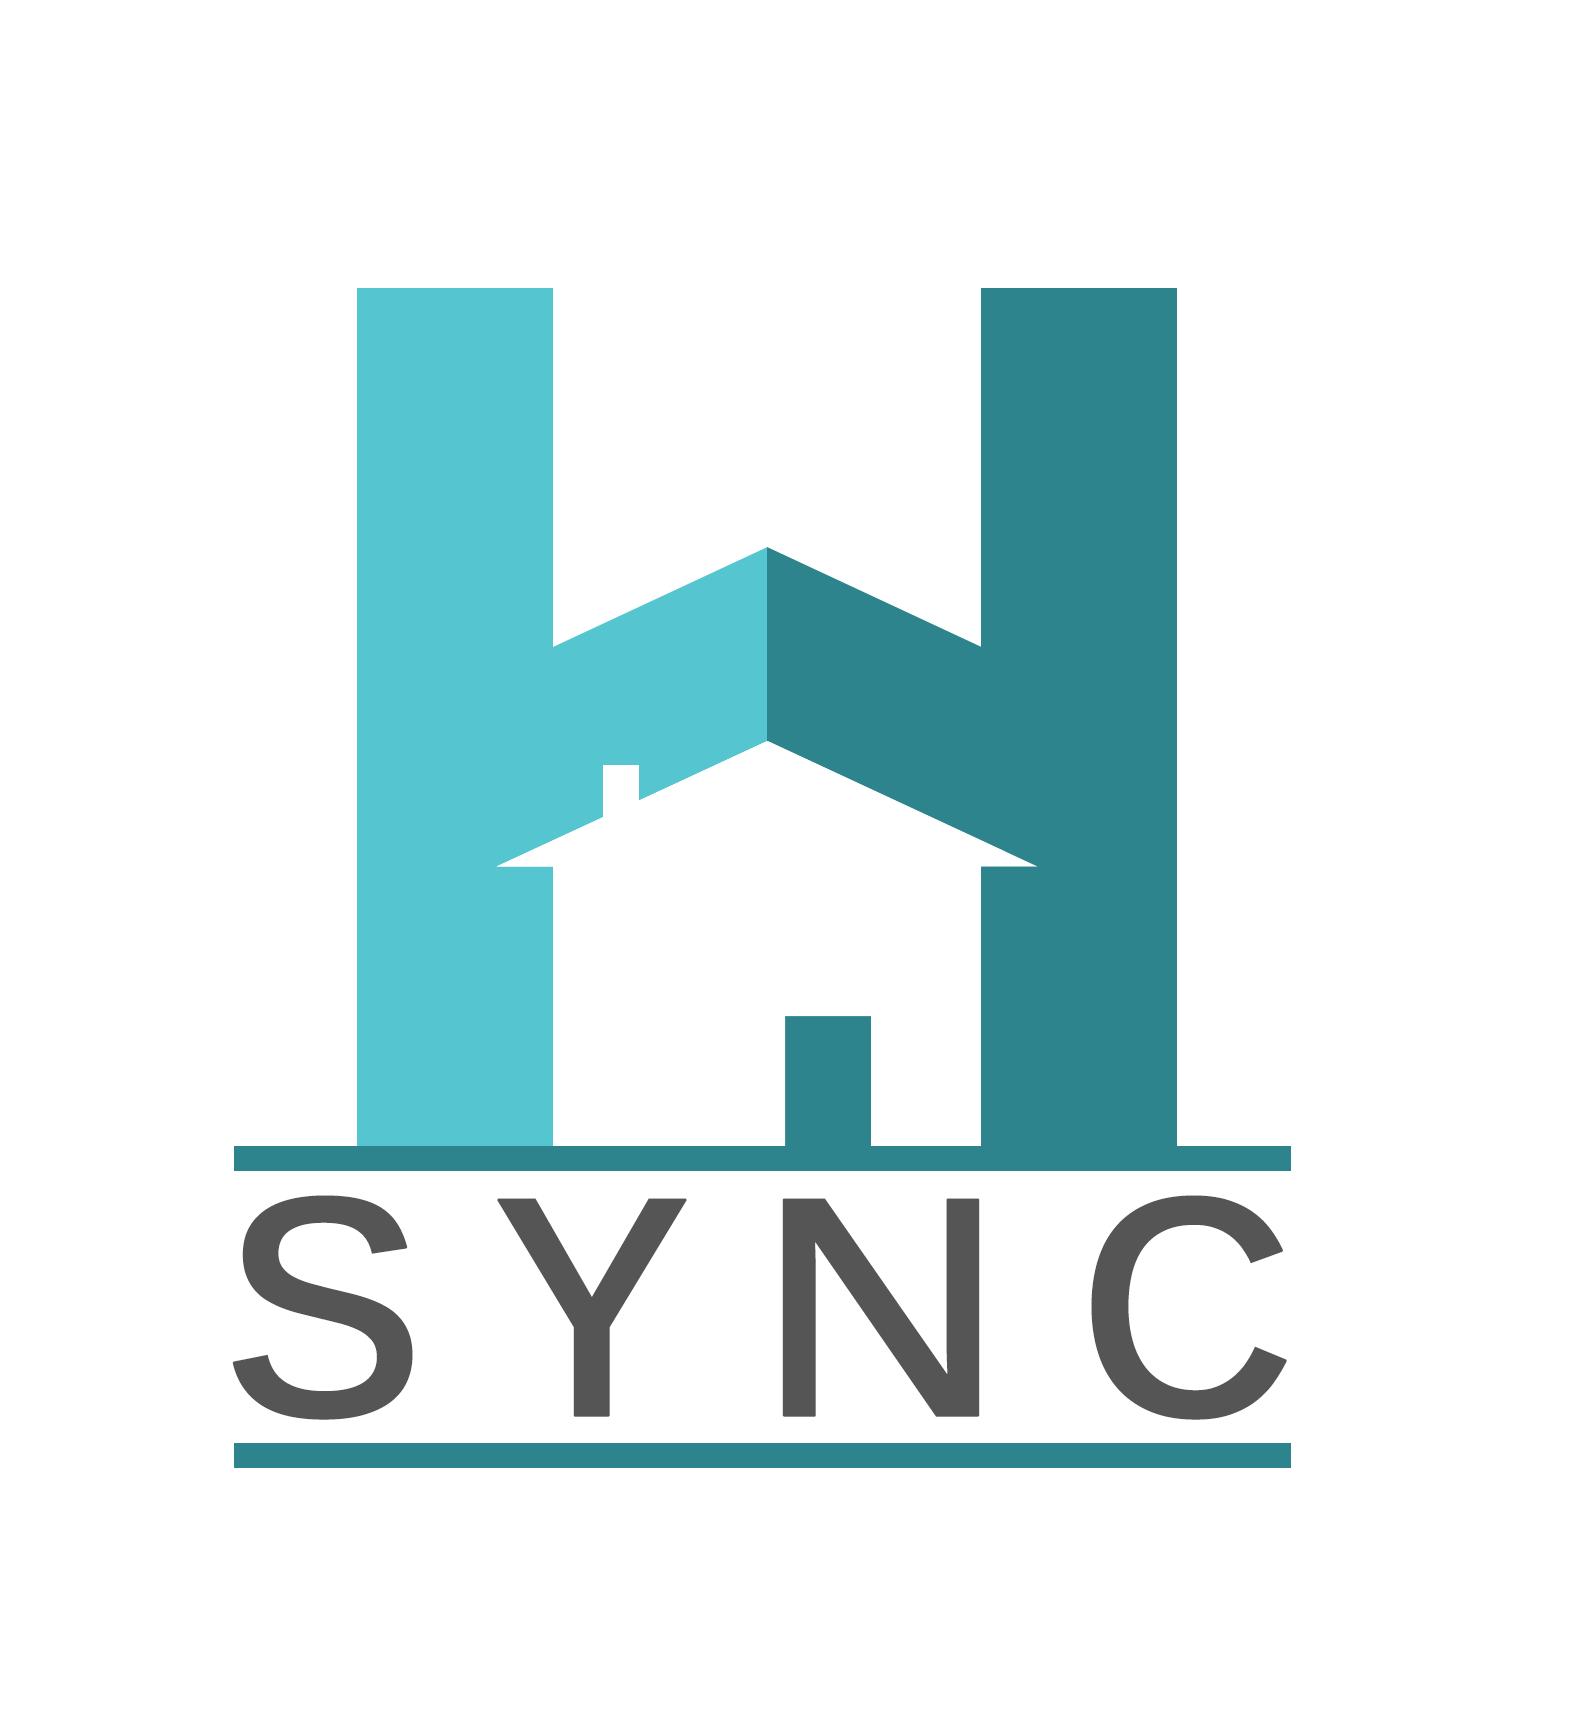 HSYNC.png